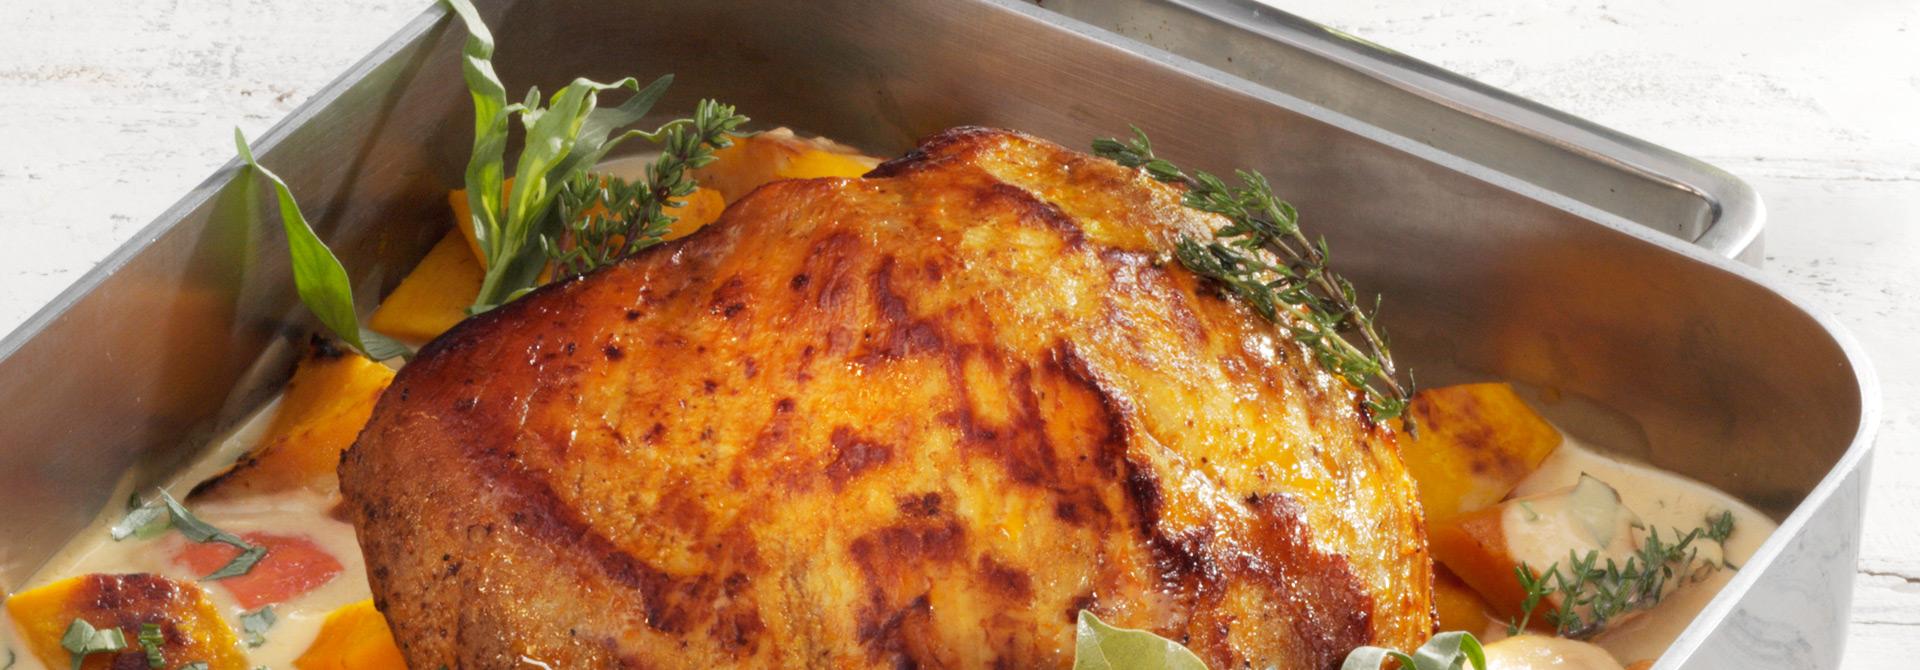 Kalbsbraten mit Kürbis in Joghurt-Estragon-Sauce | Weihenstephan